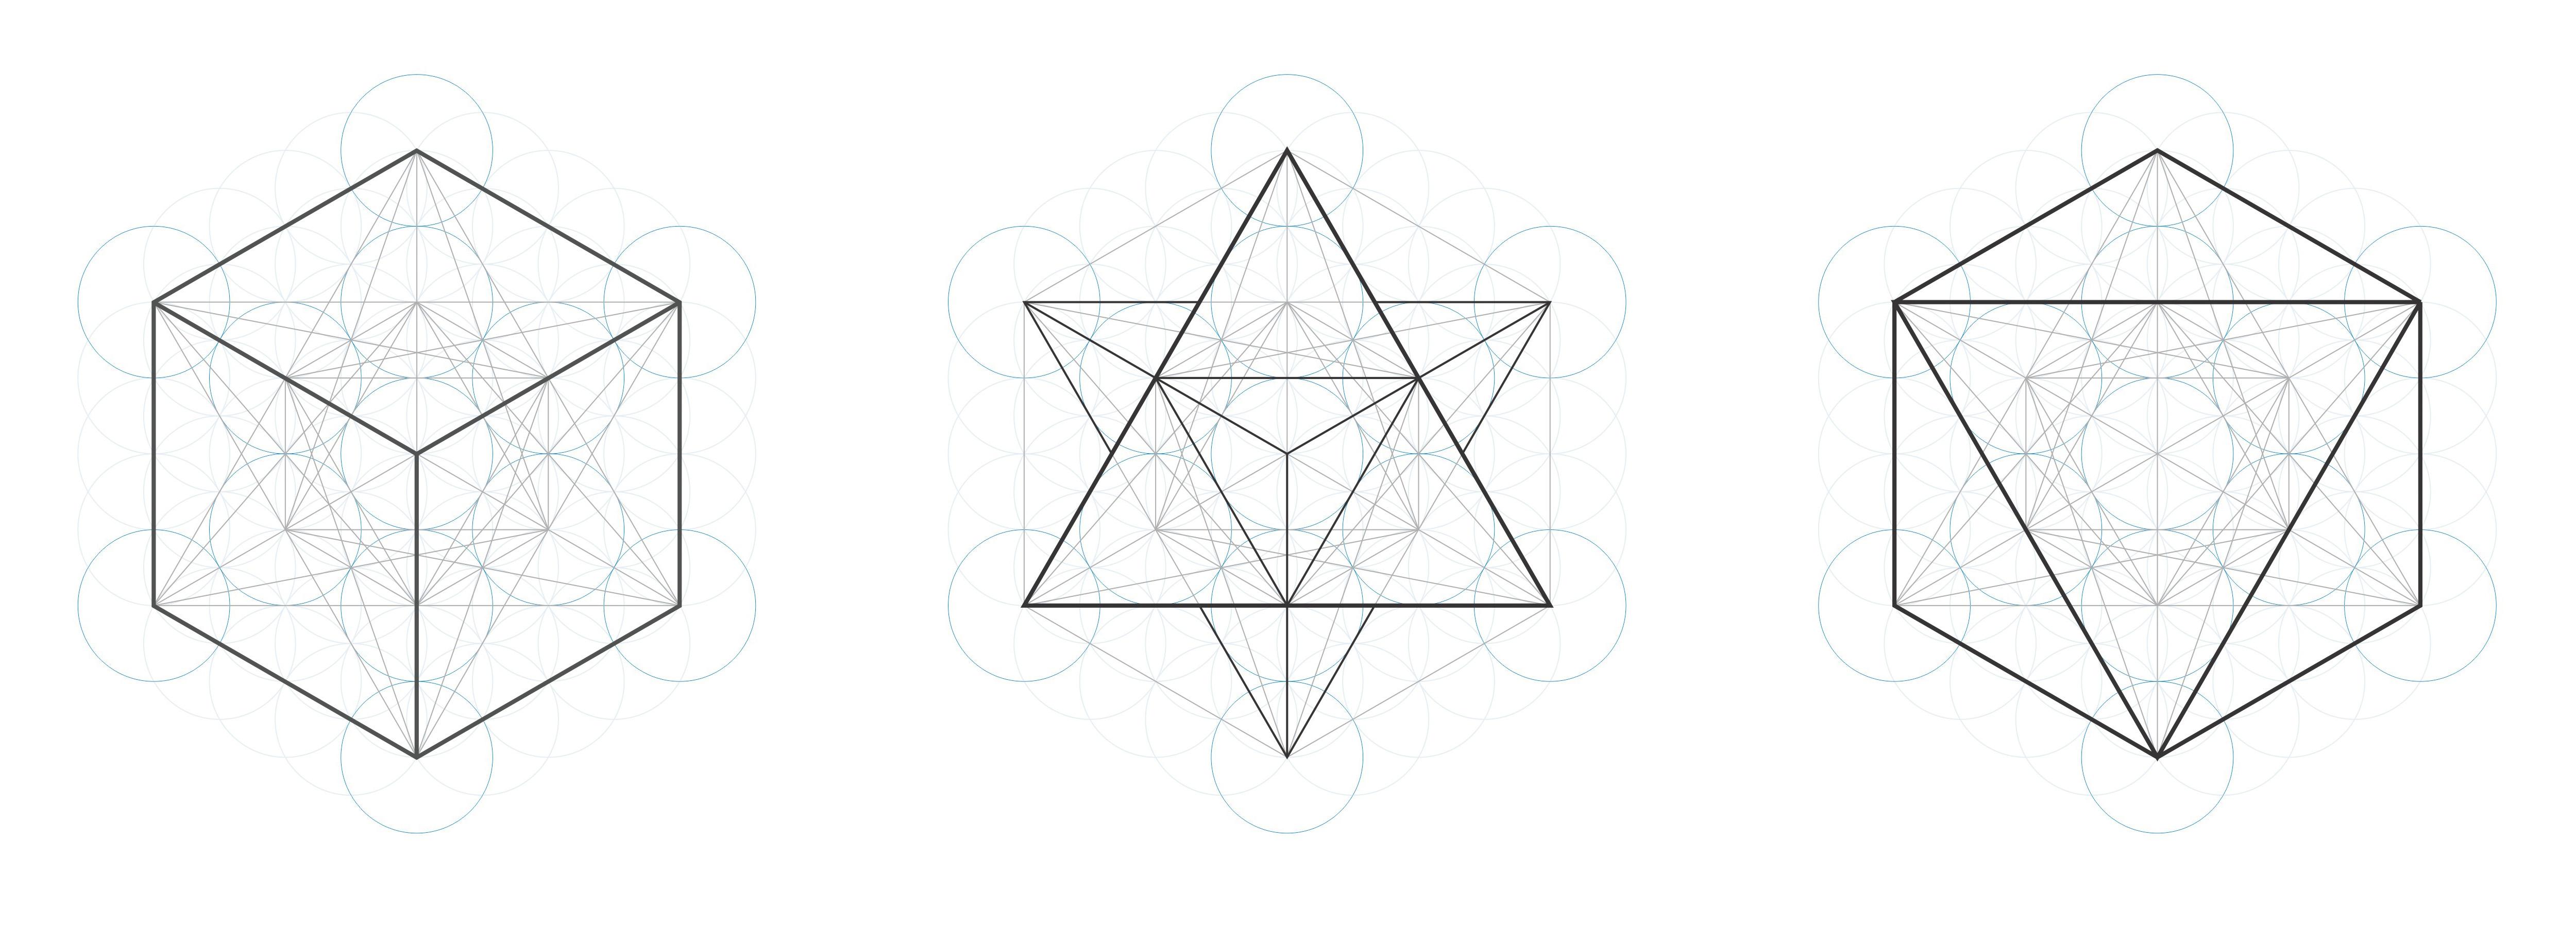 metatrons_cube_bluesketch_big1